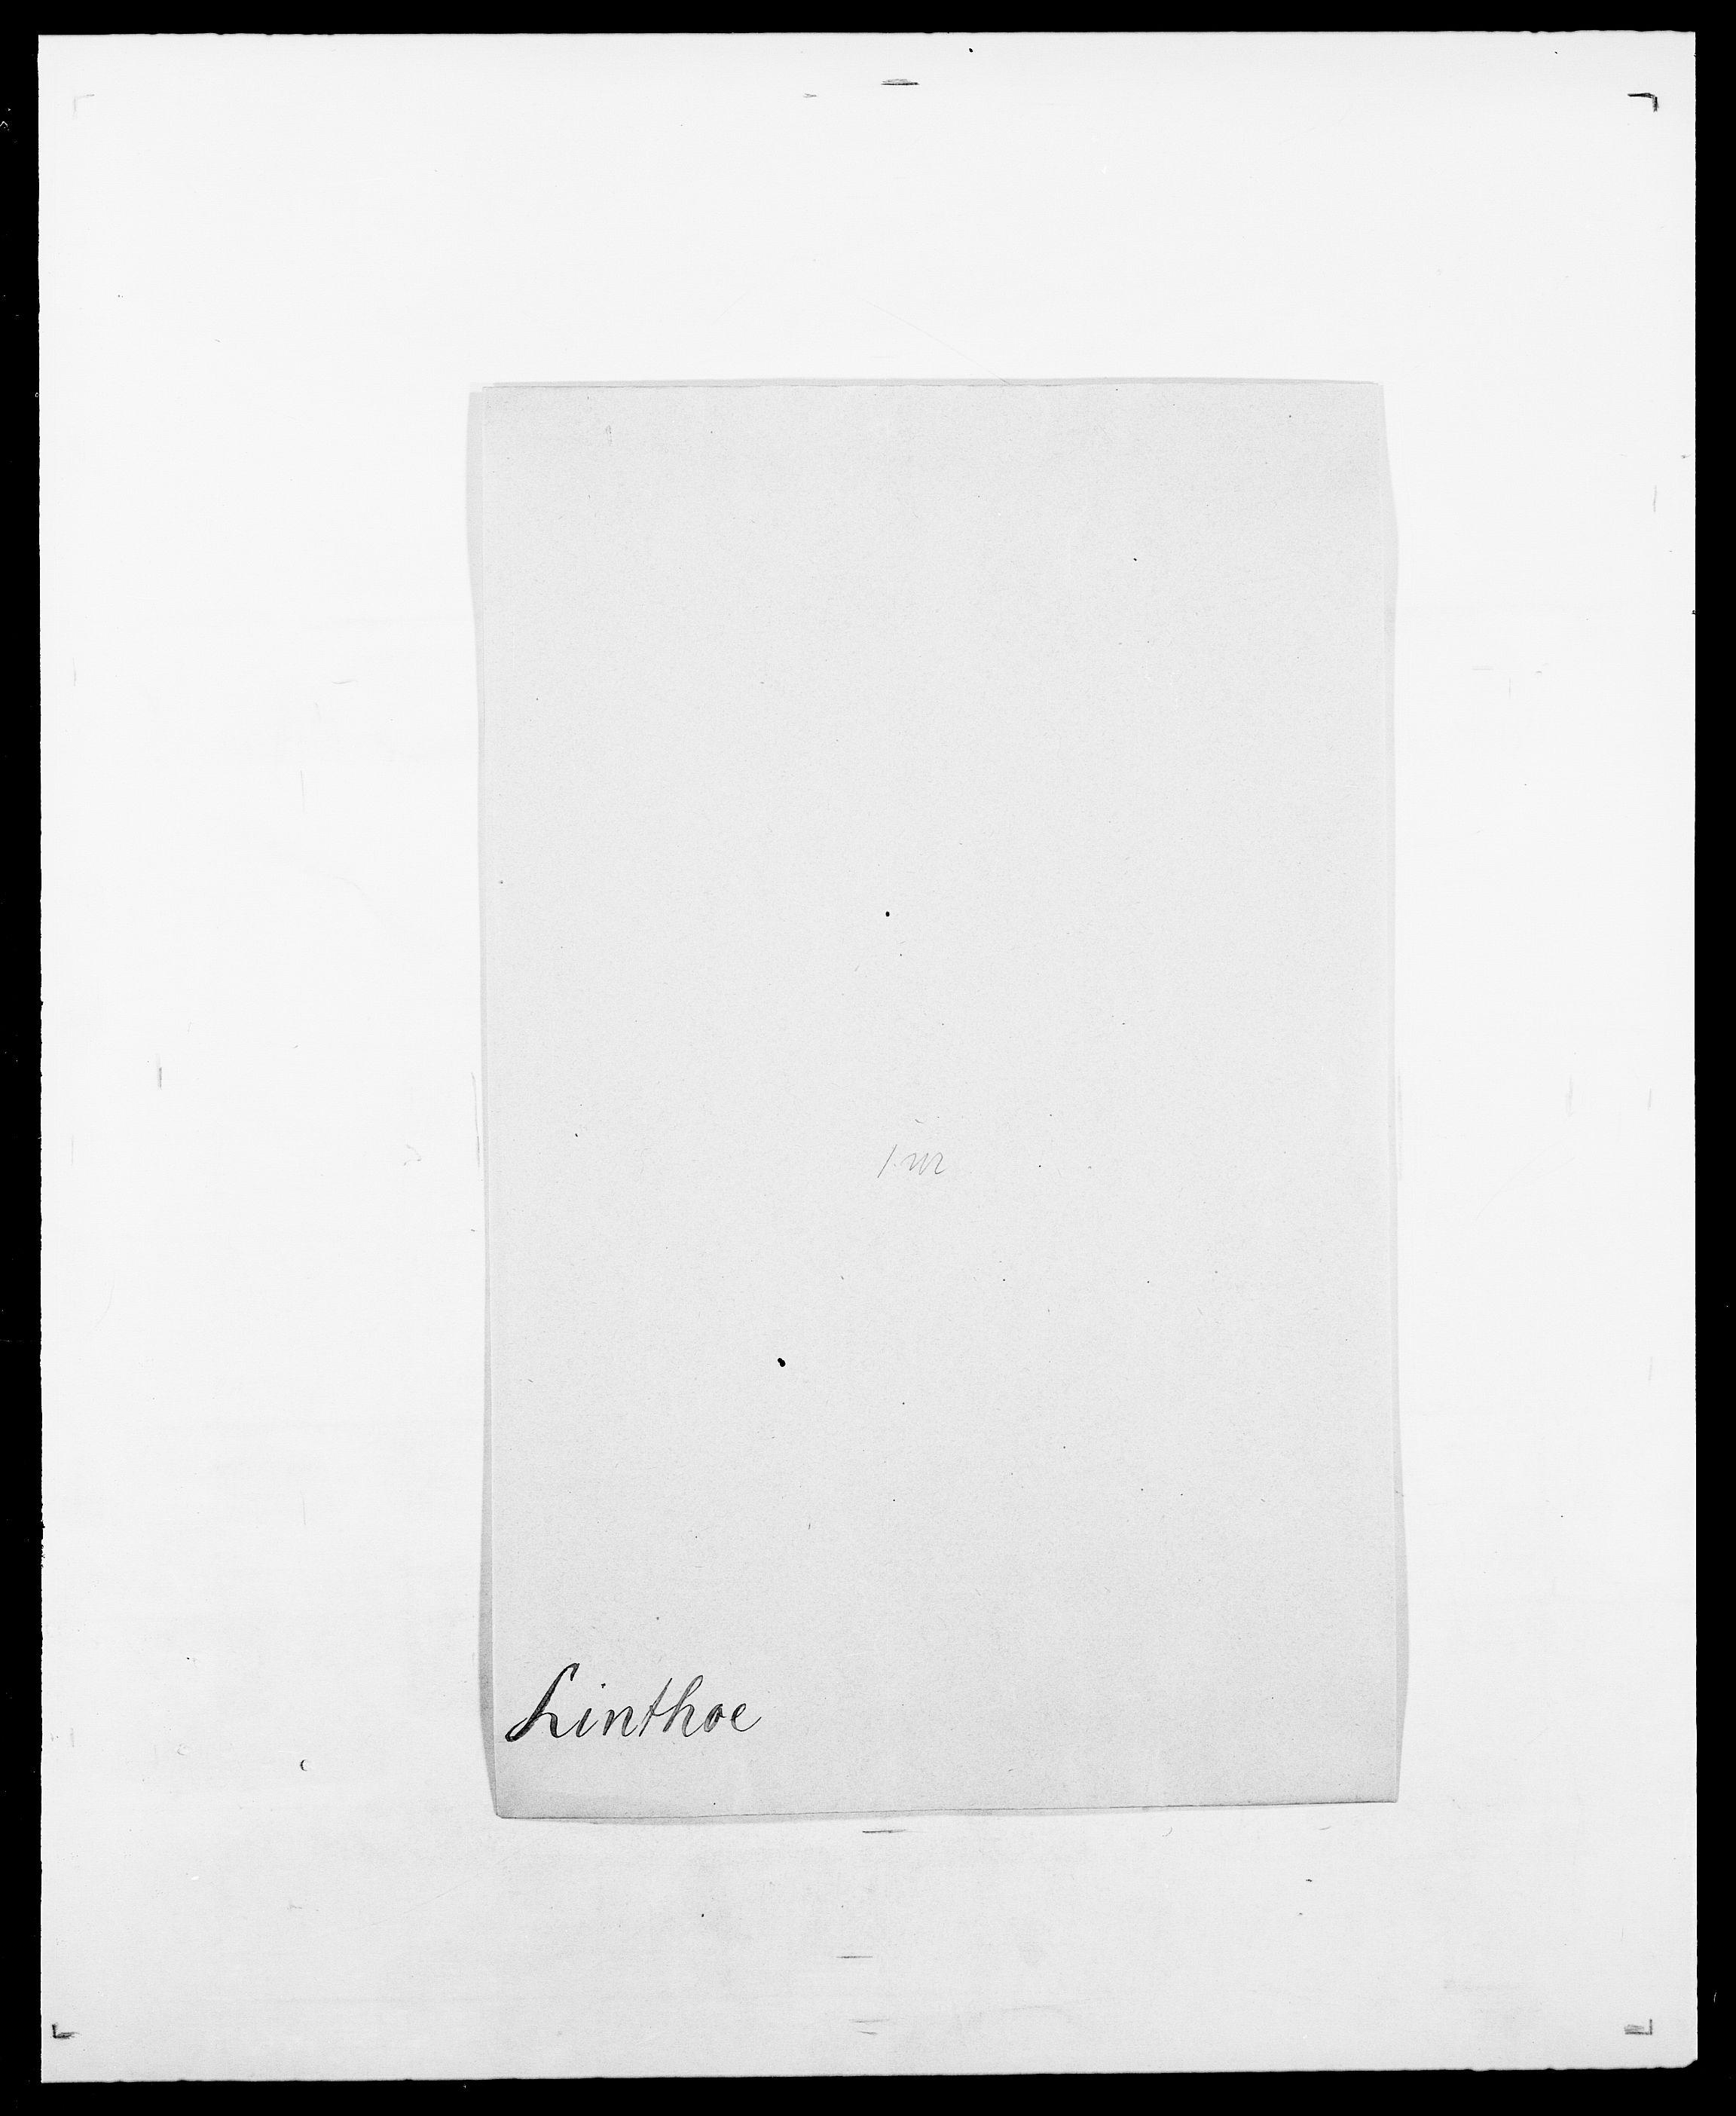 SAO, Delgobe, Charles Antoine - samling, D/Da/L0023: Lau - Lirvyn, s. 676